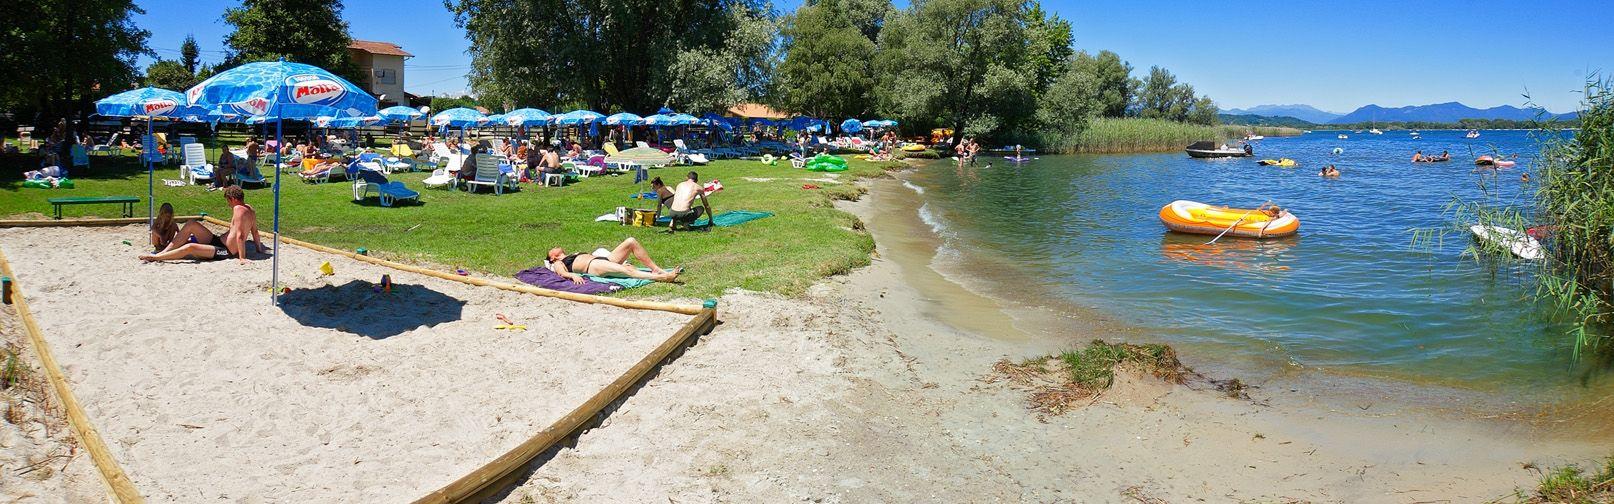 Karte Lago Maggiore Und Umgebung.Camping Village Lago Maggiore Campingplatz Lago Maggiore